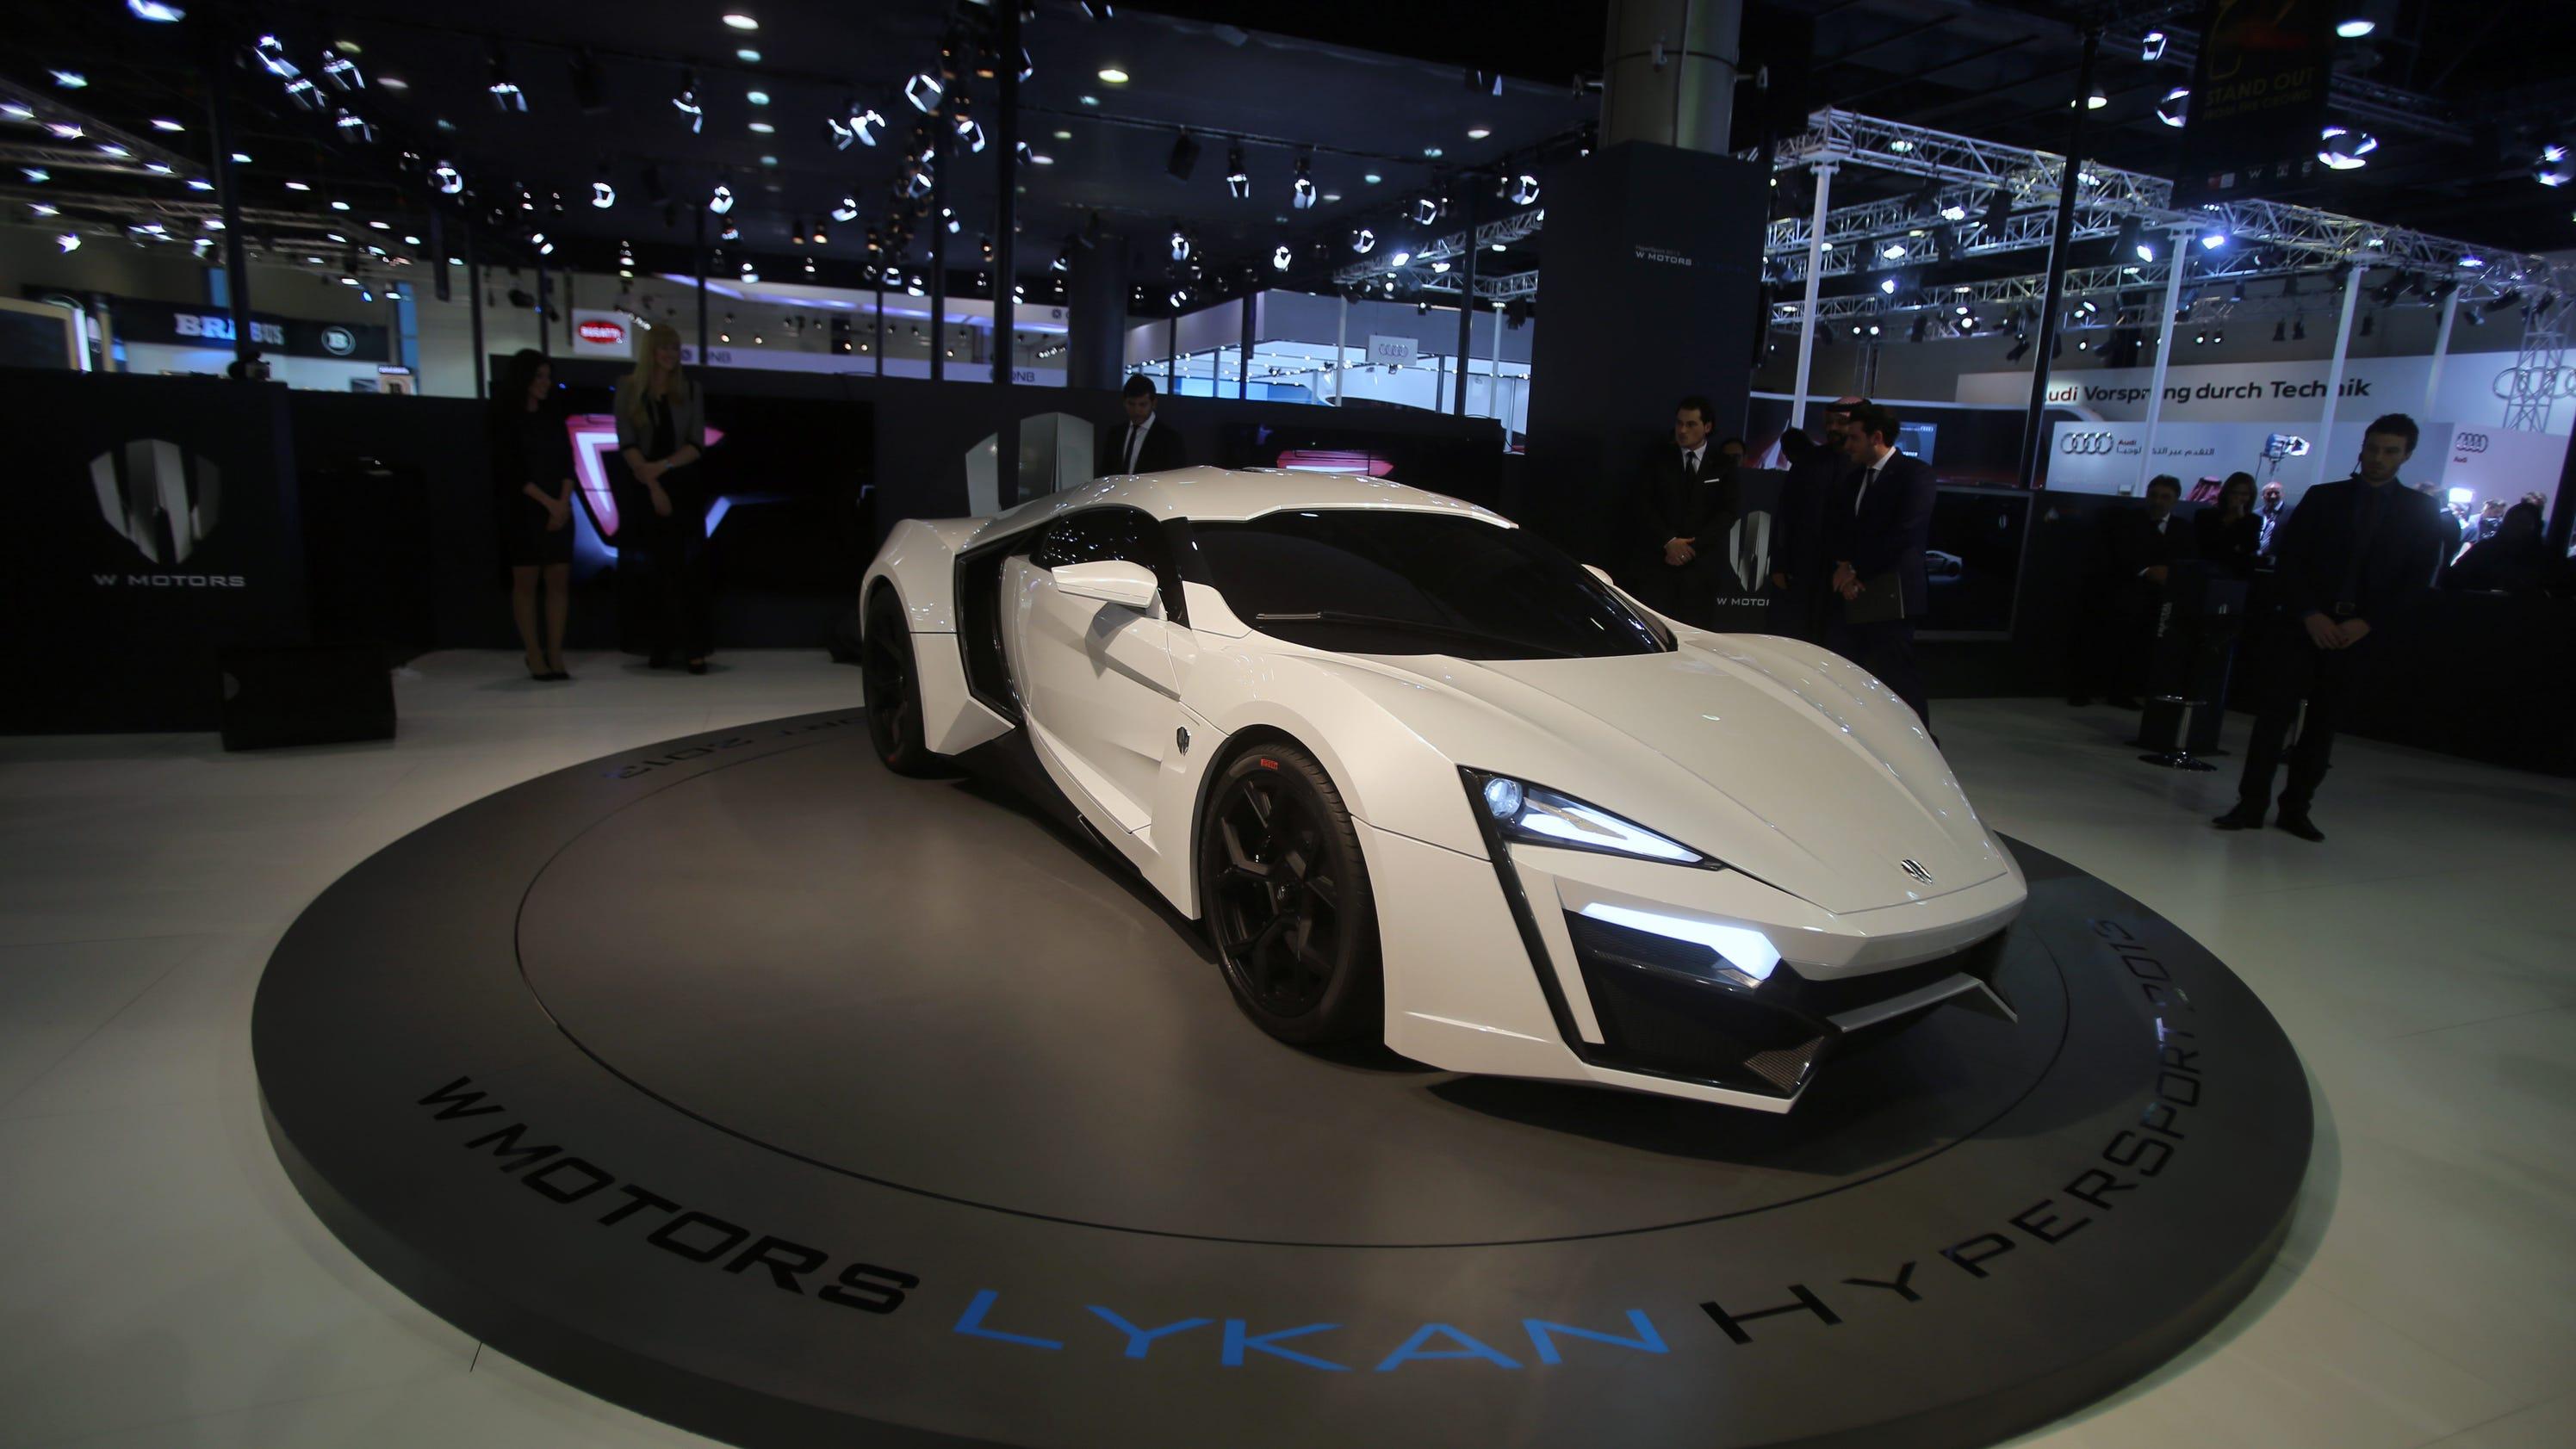 3 000 Dollar Cars >> Luxury automakers tout million-dollar cars